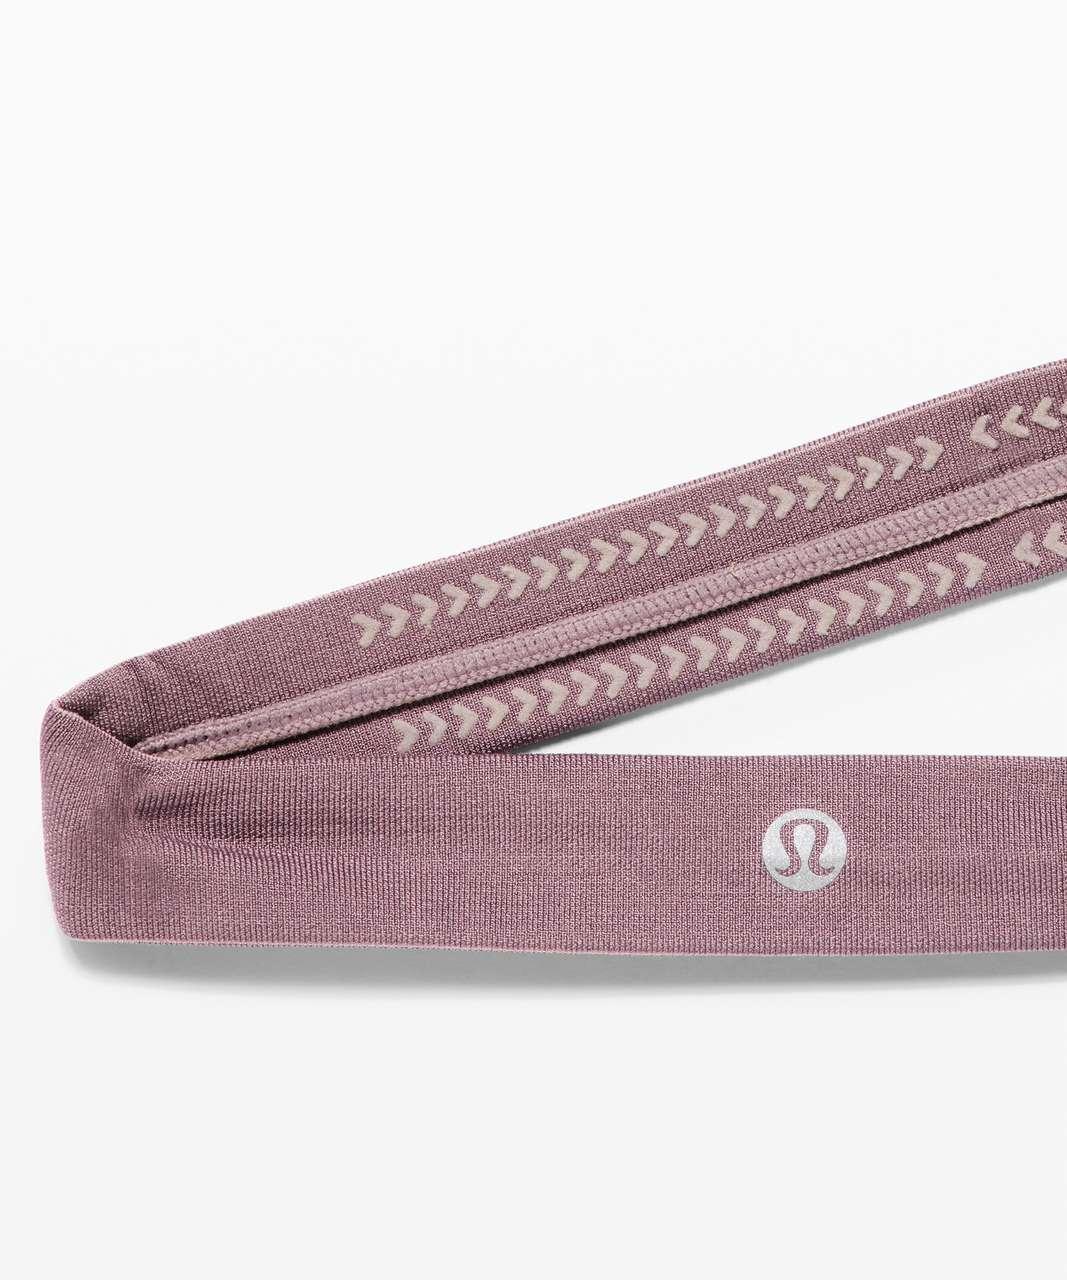 Lululemon Cardio Cross Trainer Headband - Smoky Blush / Frosted Mulberry